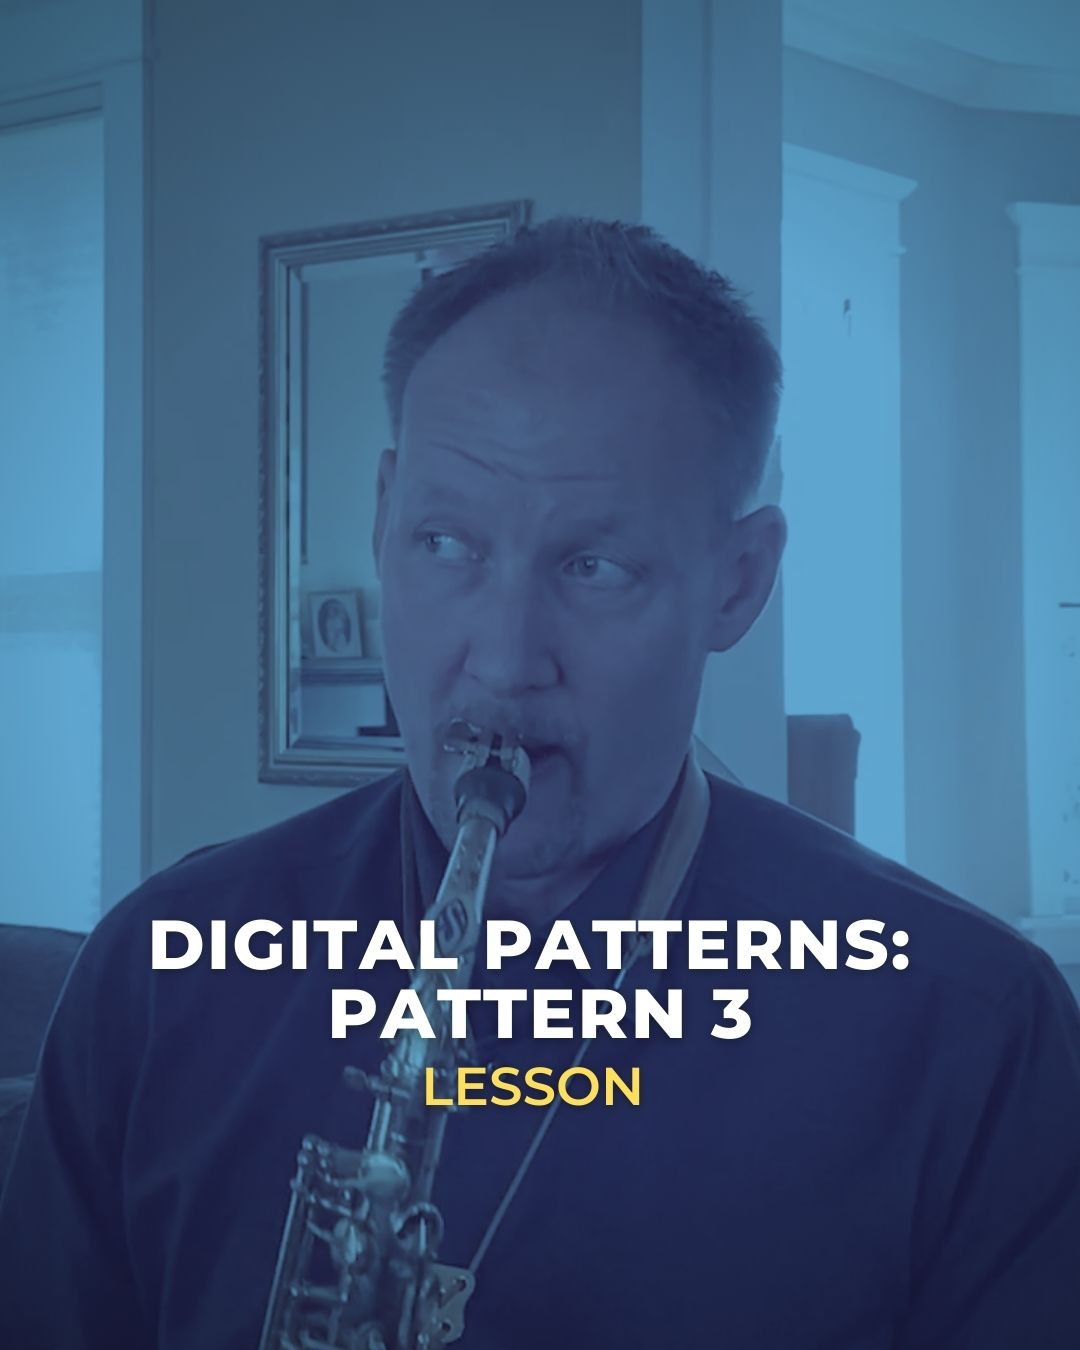 Digital Pattern 3